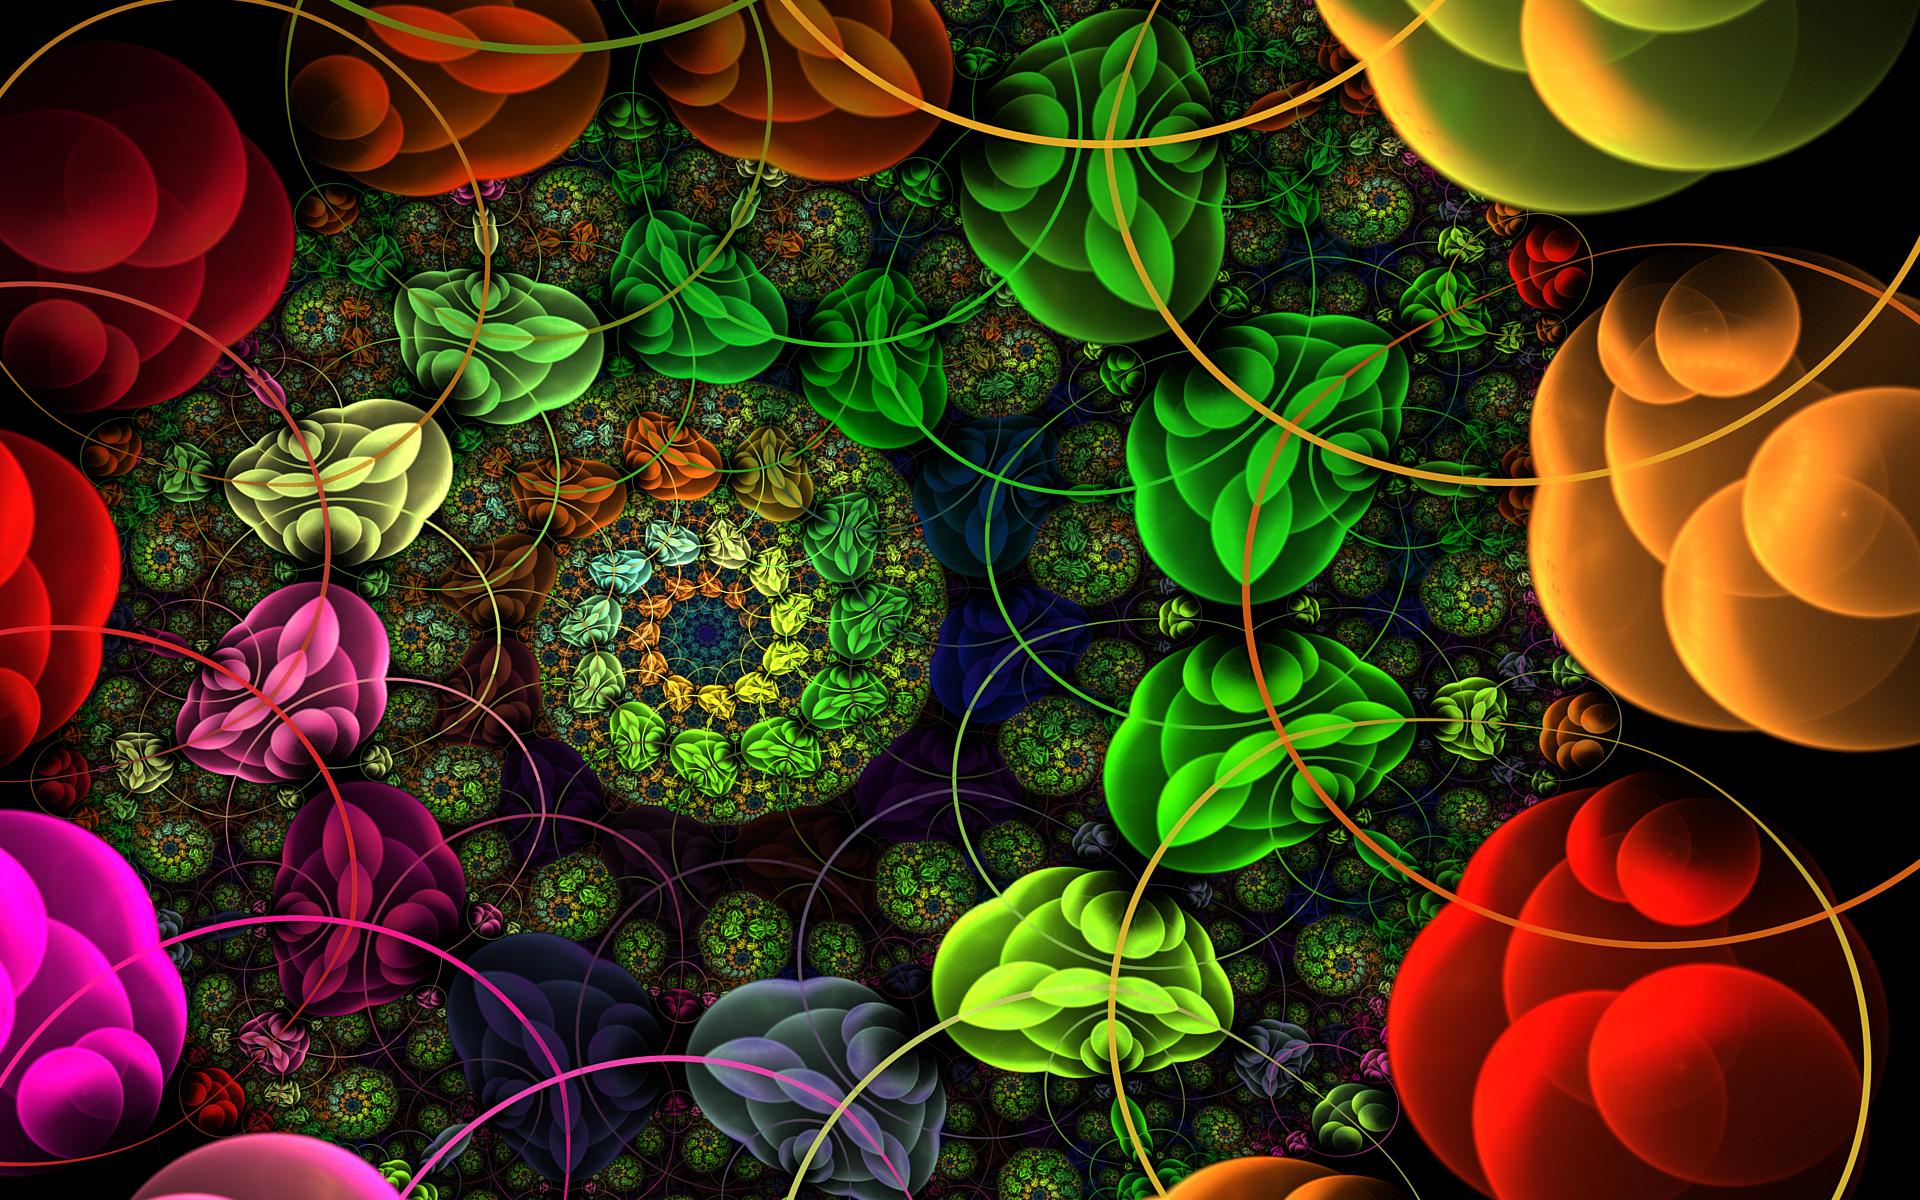 Glynnsim Flowers by SuicideBySafetyPin